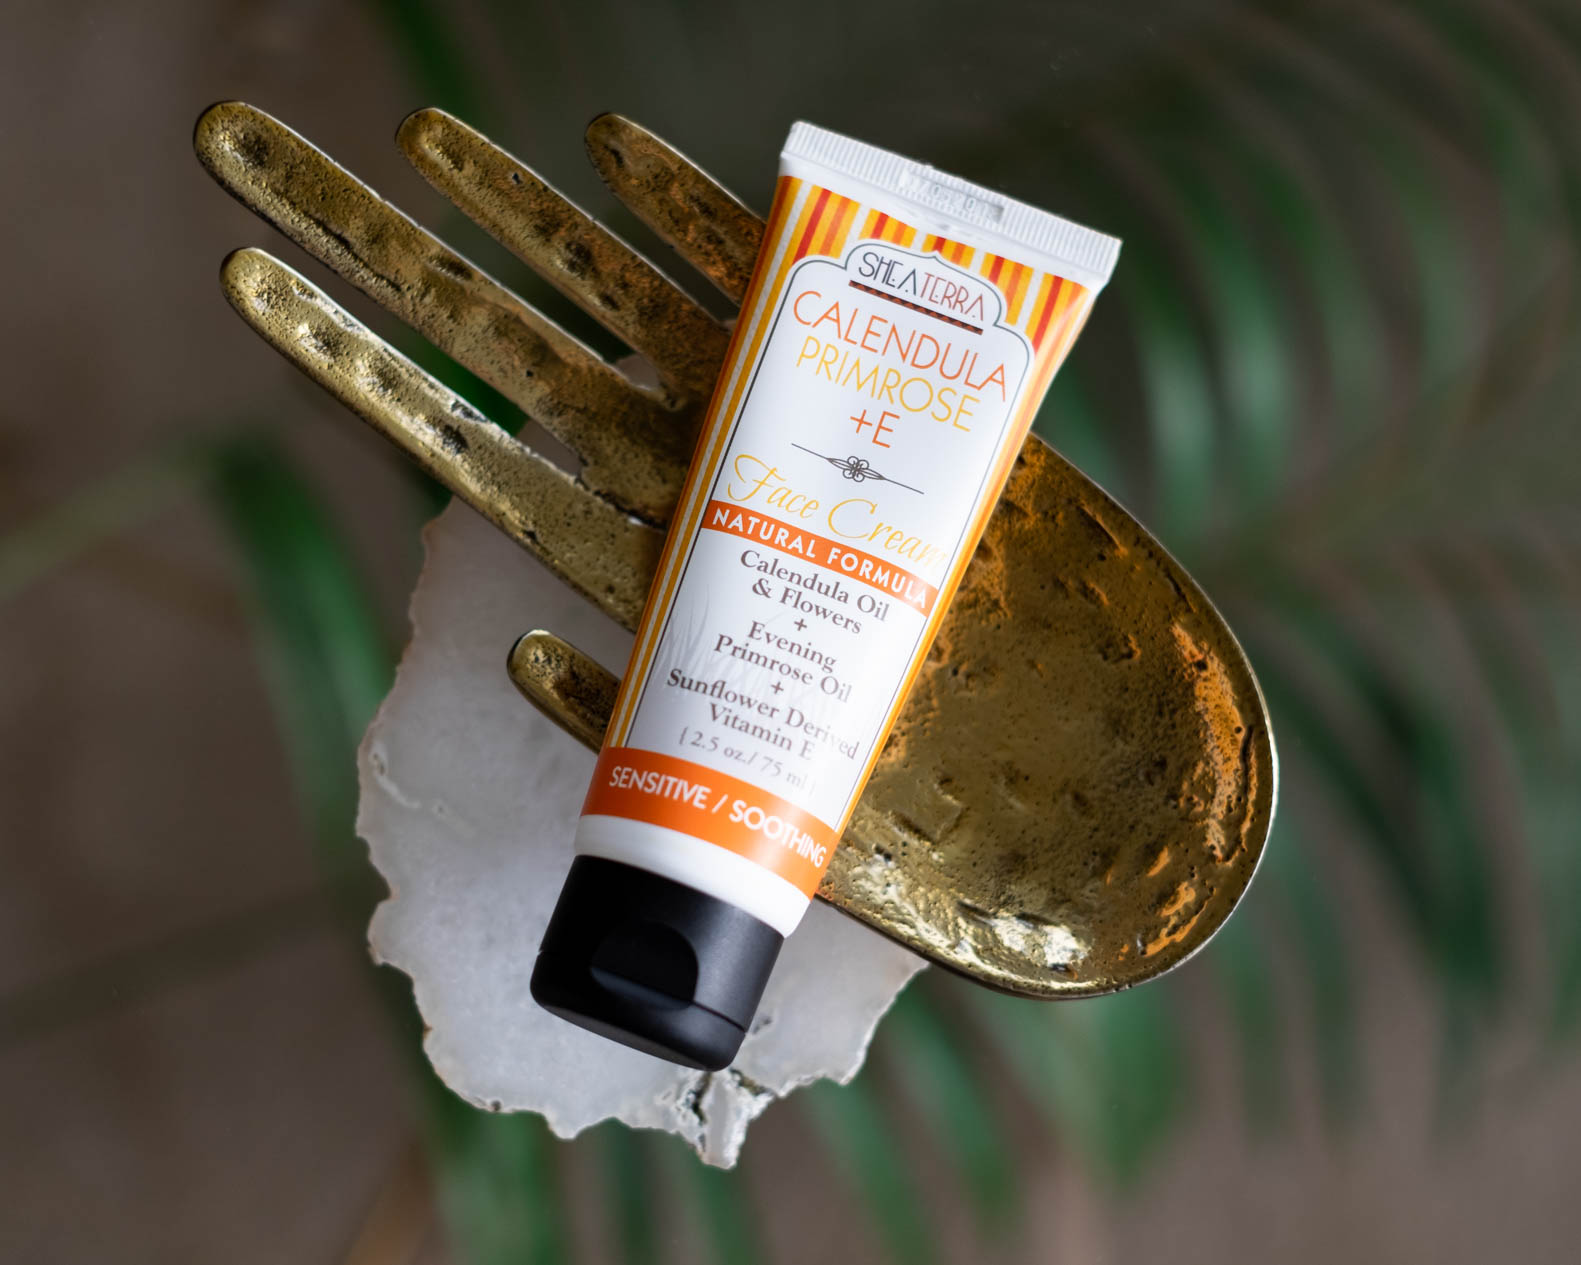 Shea Terra Organics Calendula Primrose + E Face Cream